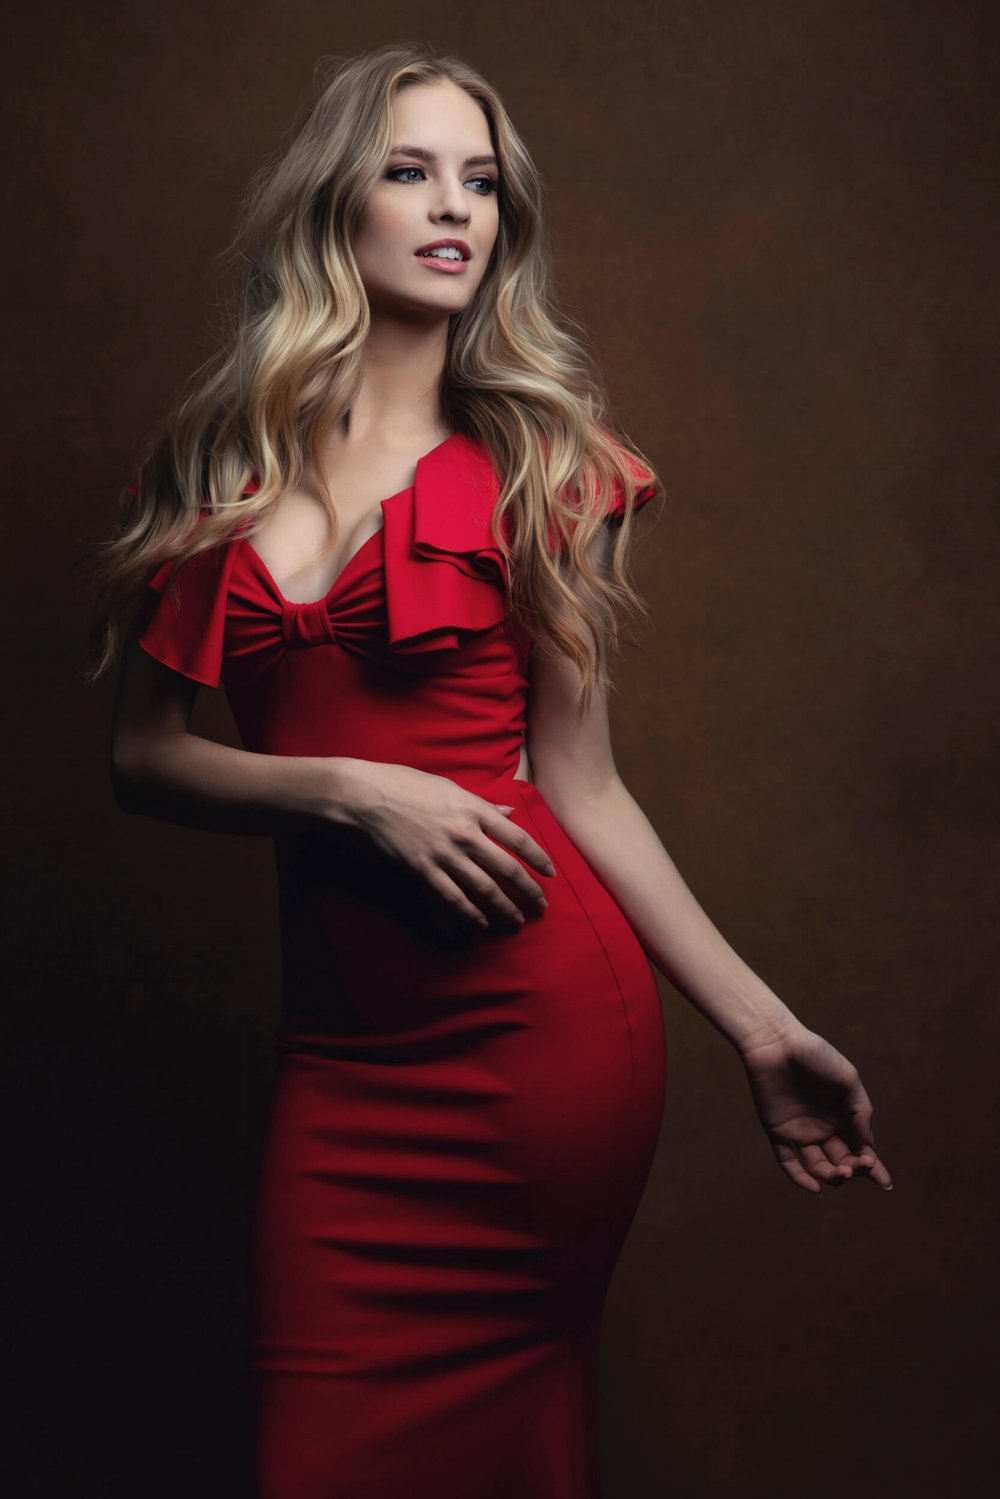 Beautiful blond girl Red-dress portraiture Starnberg